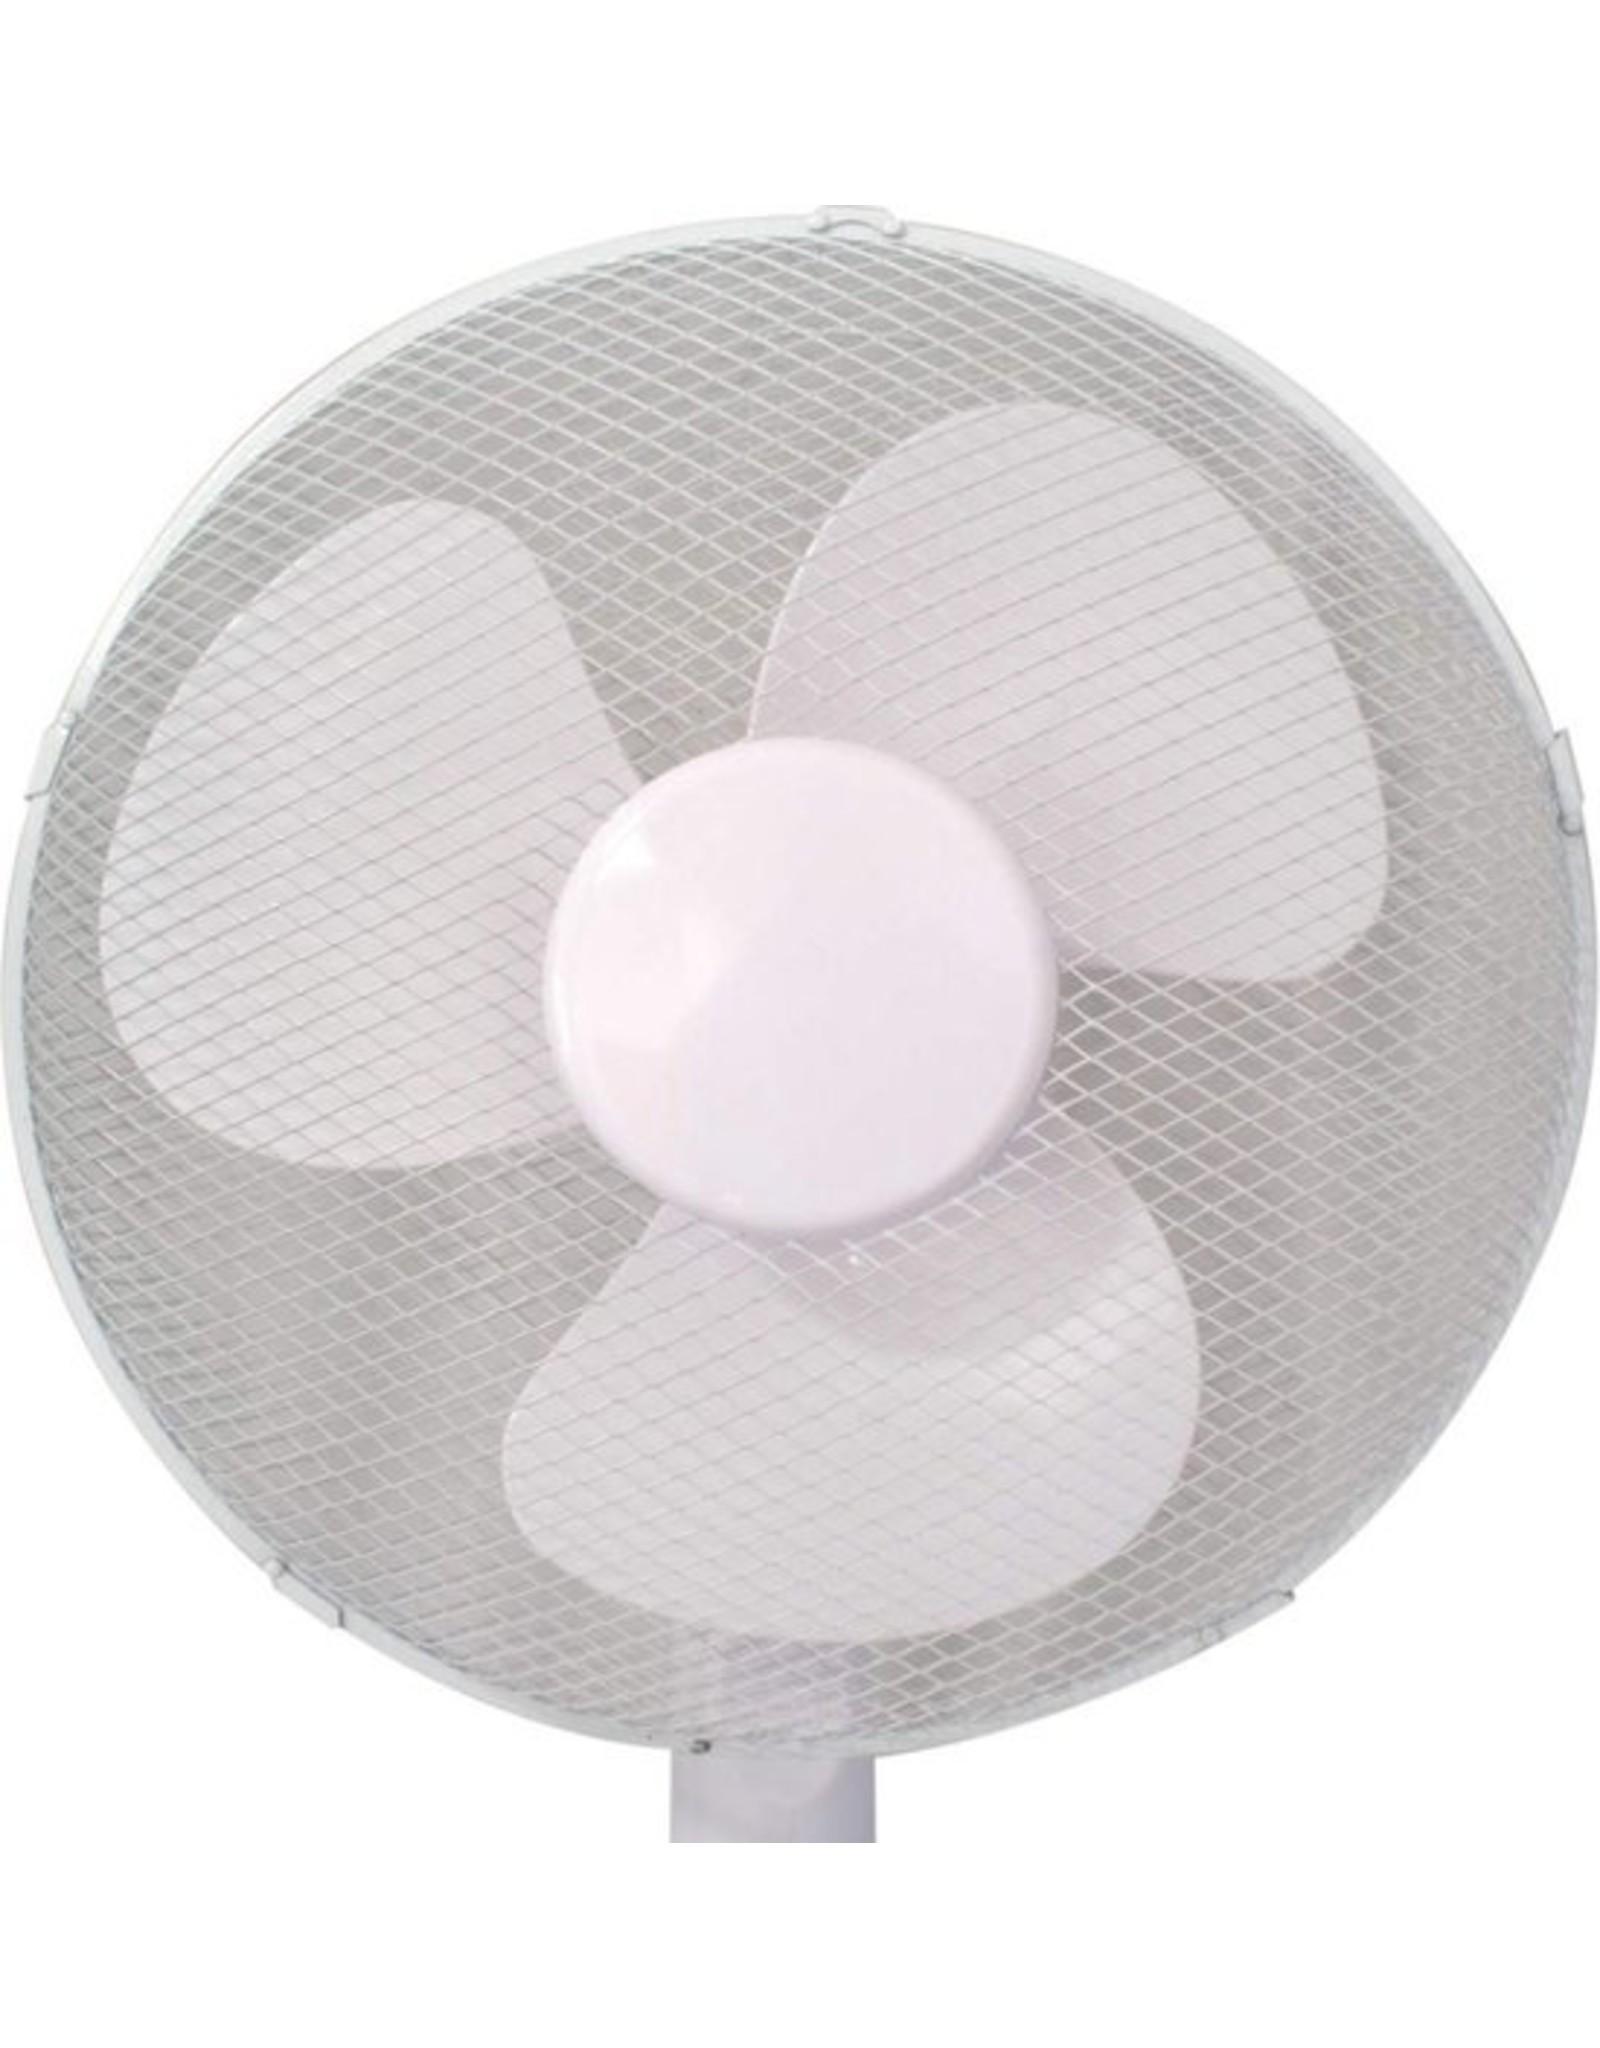 Cool Serie Tripod fan - 40 cm diameter - 3 levels - white